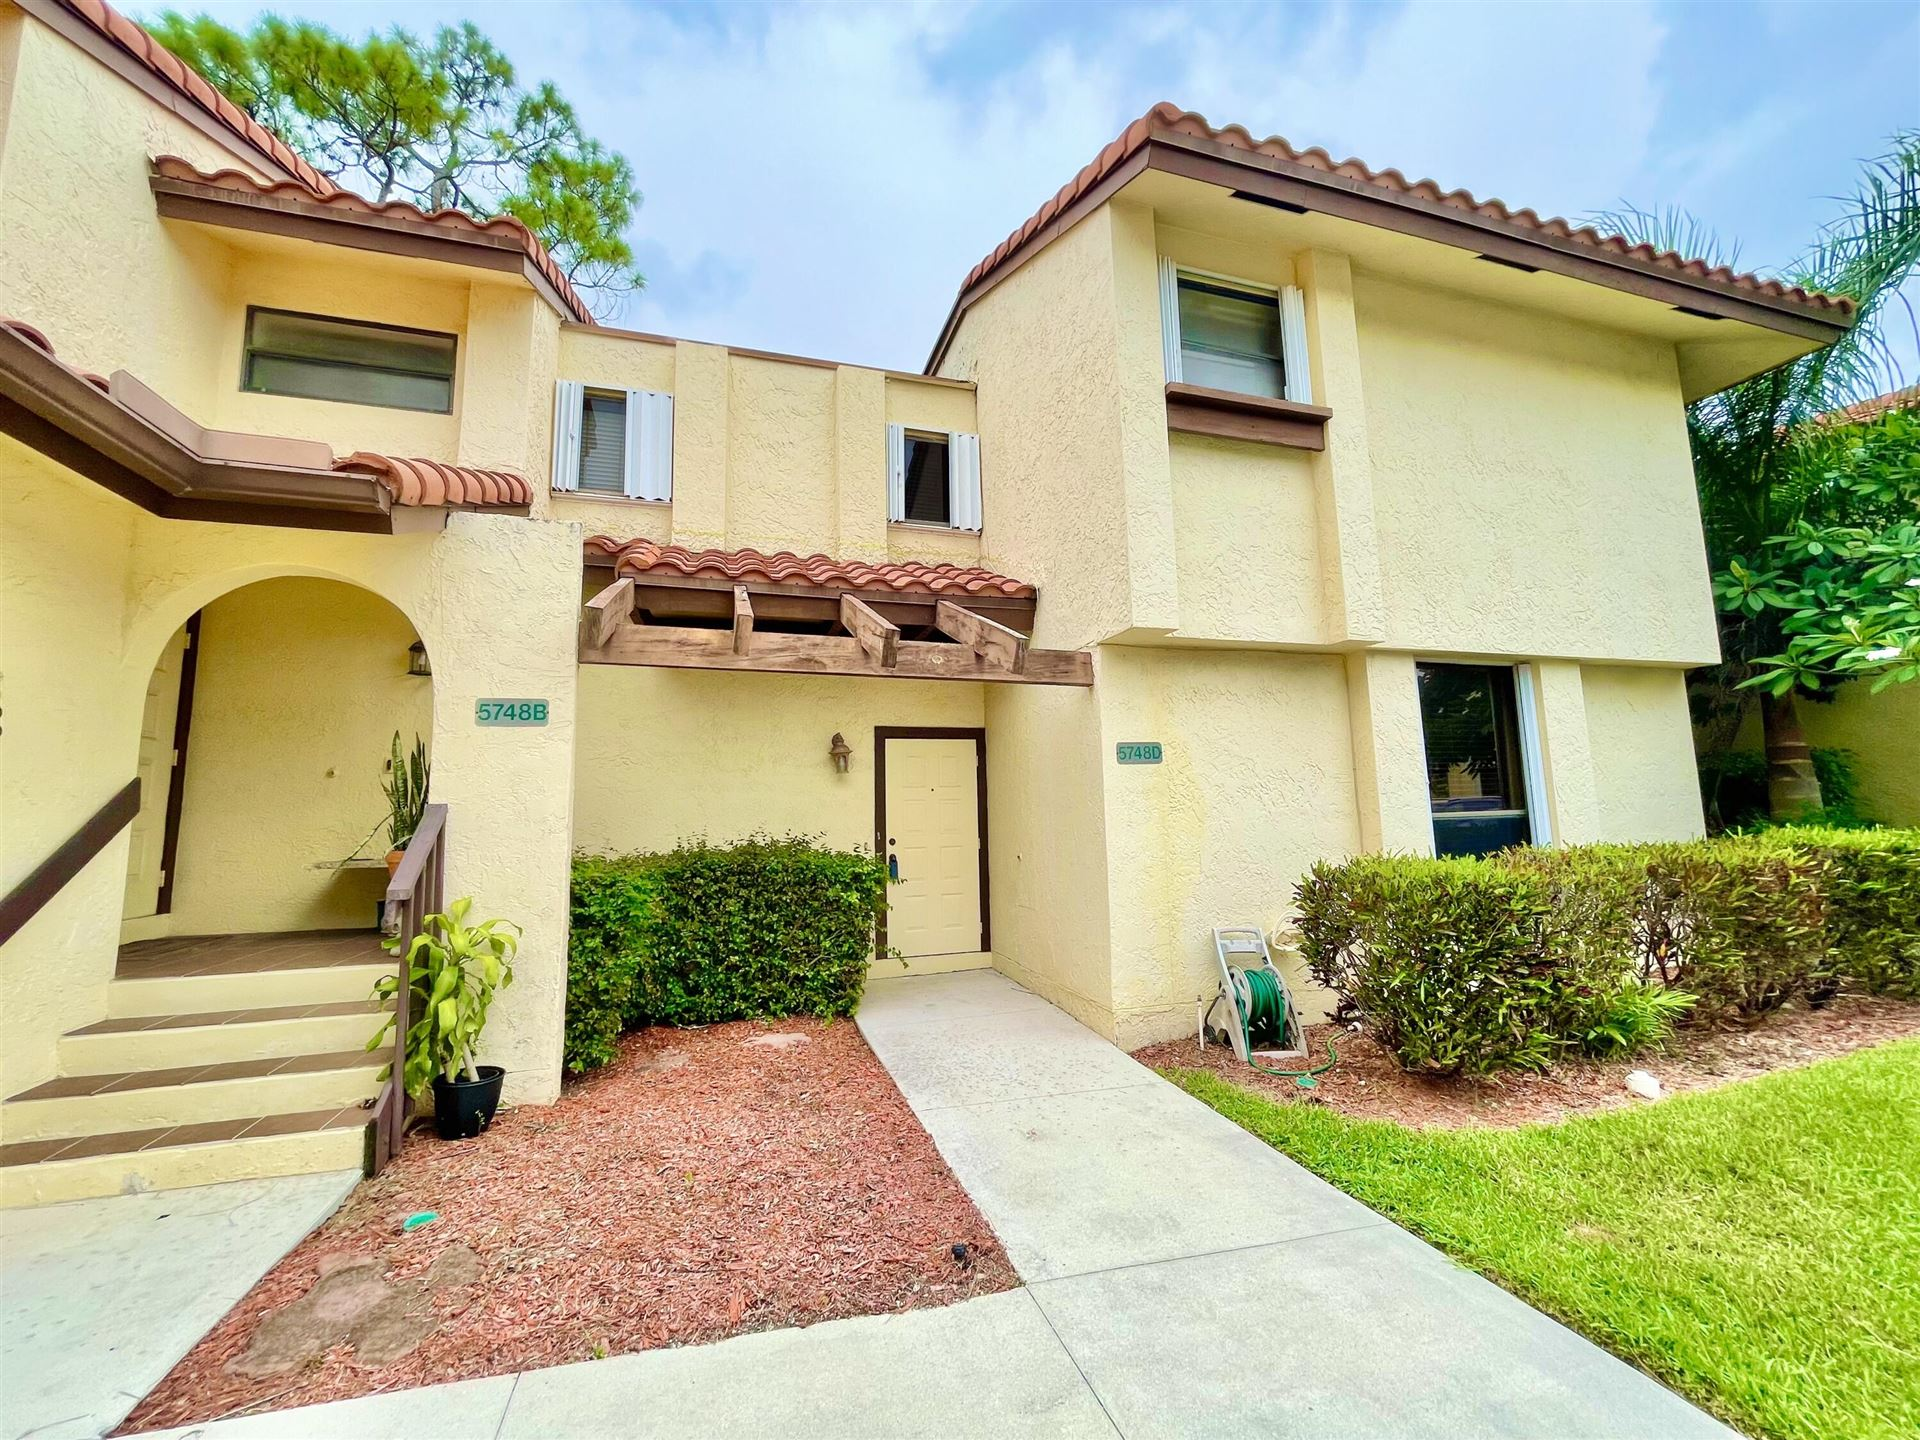 5748 Fox Hollow Drive #D, Boca Raton, FL 33486 - #: RX-10729147